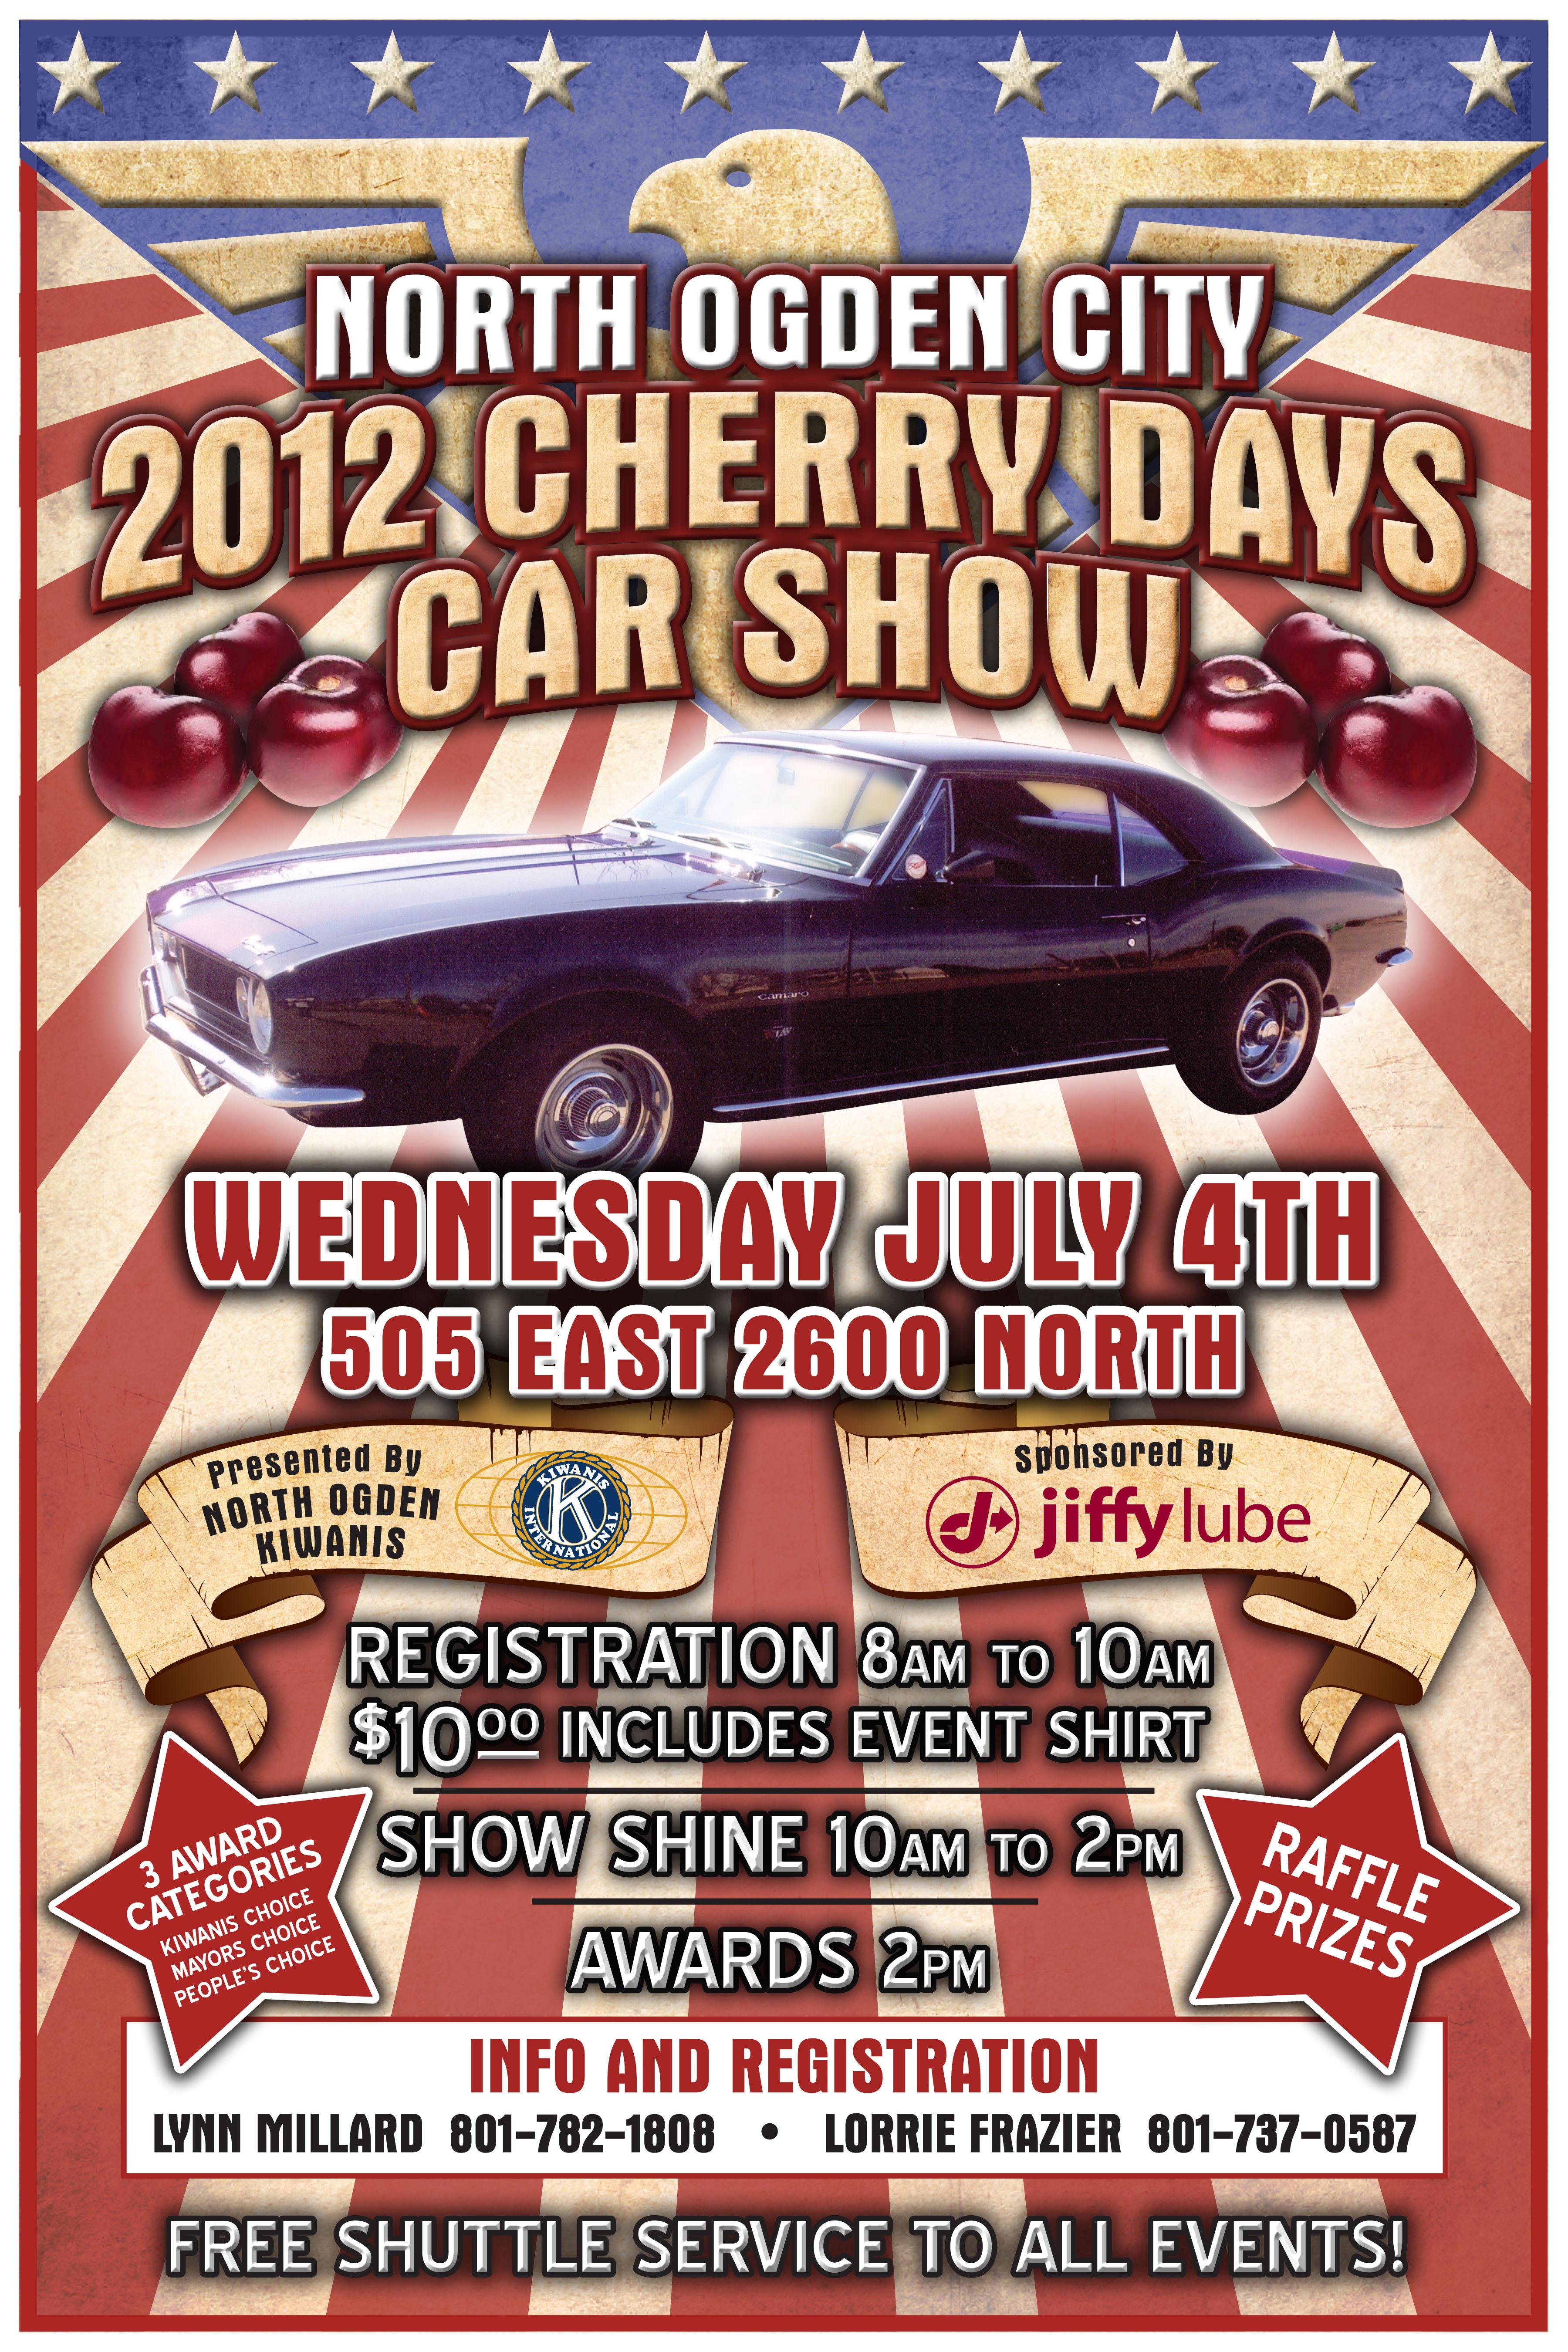 Jeremy James NOgden Cherry Days Car Show - Car show award categories